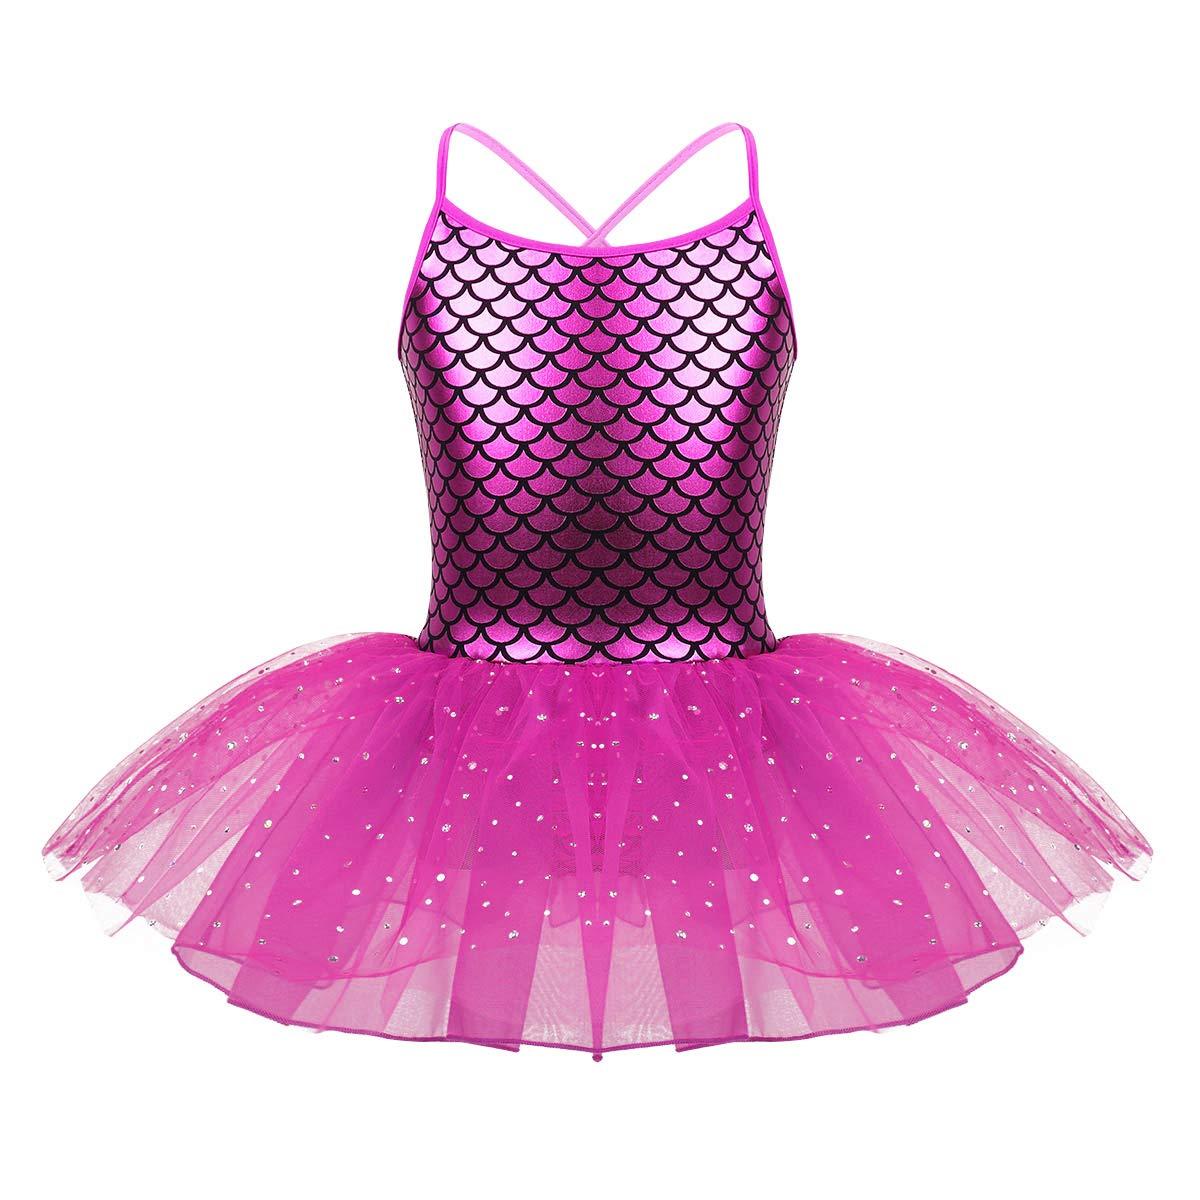 YONGHS Kids Girls Ballet Dance Tutu Dress Spaghetti Shoulder Straps Criss Cross Back Gymnastic Bodysuit